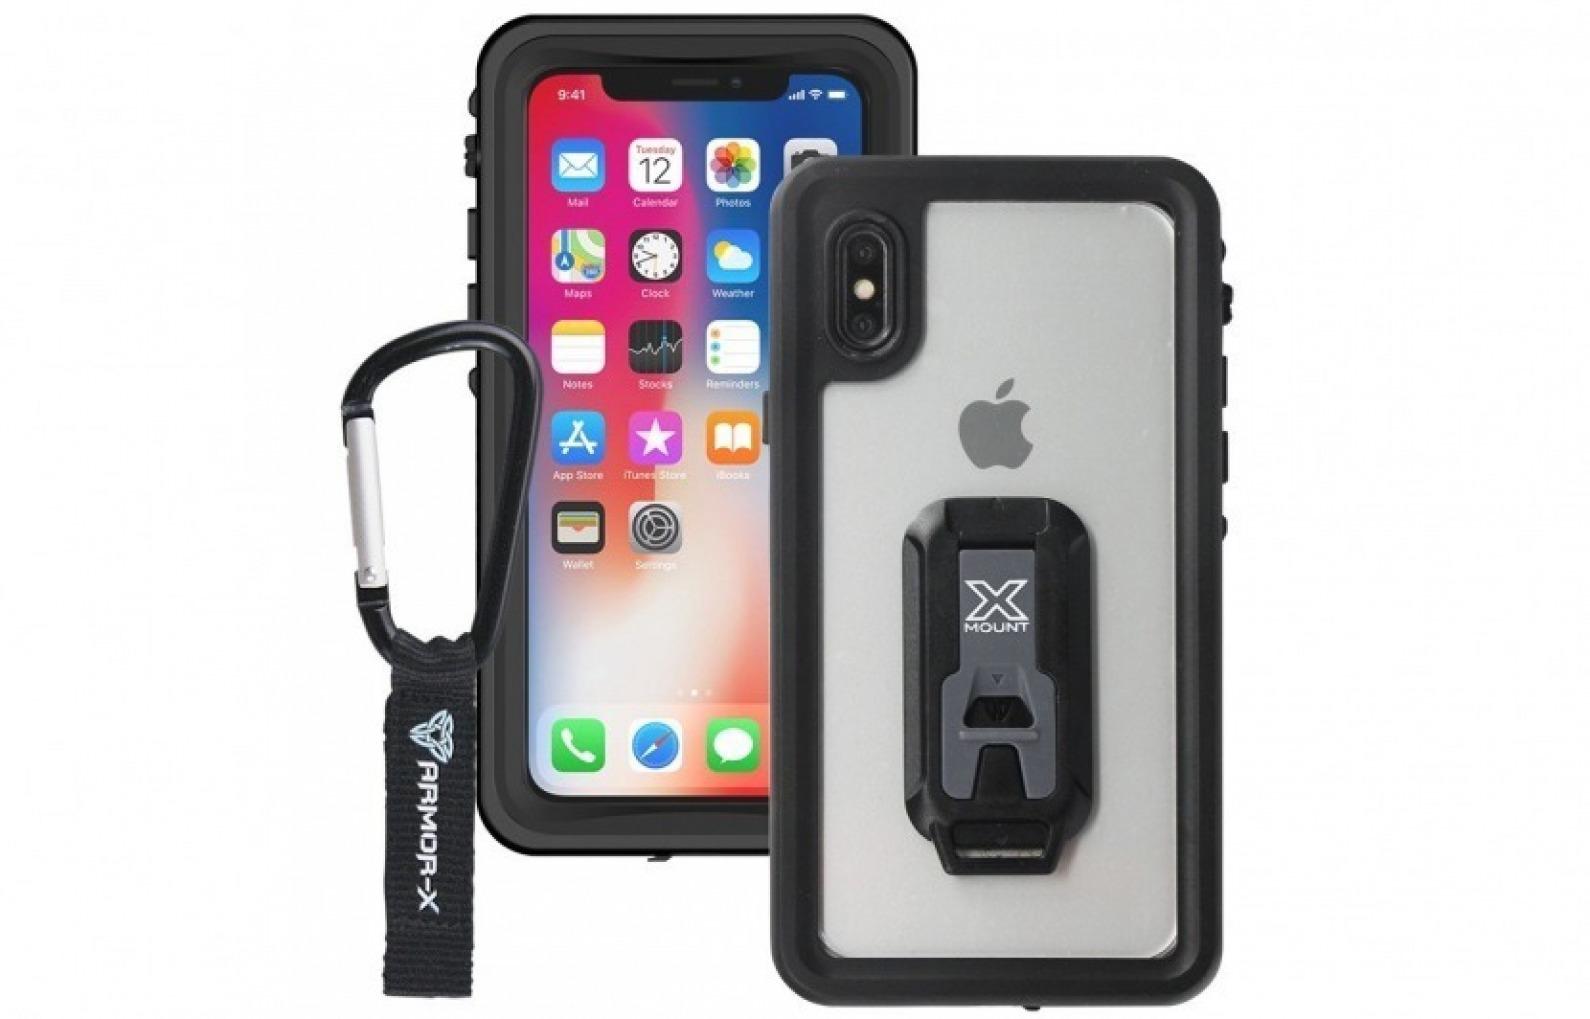 Best Iphone Xs Xs Max Xr Cases Of 2018 Waterproof Drop